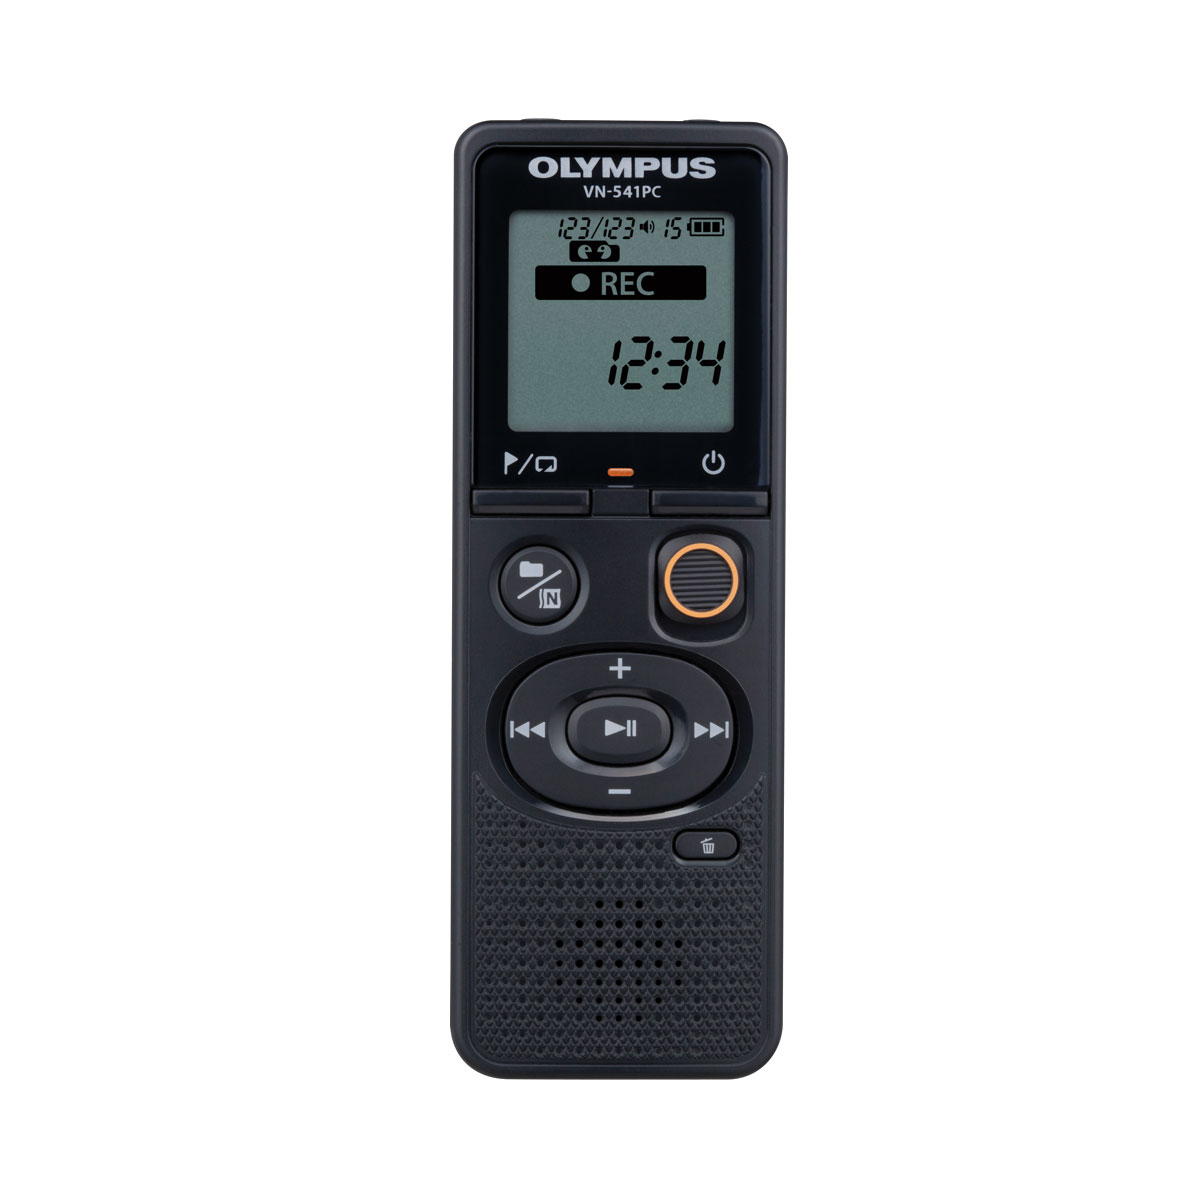 Olympus Digital Voice Recorder VN-541PC - 4GB